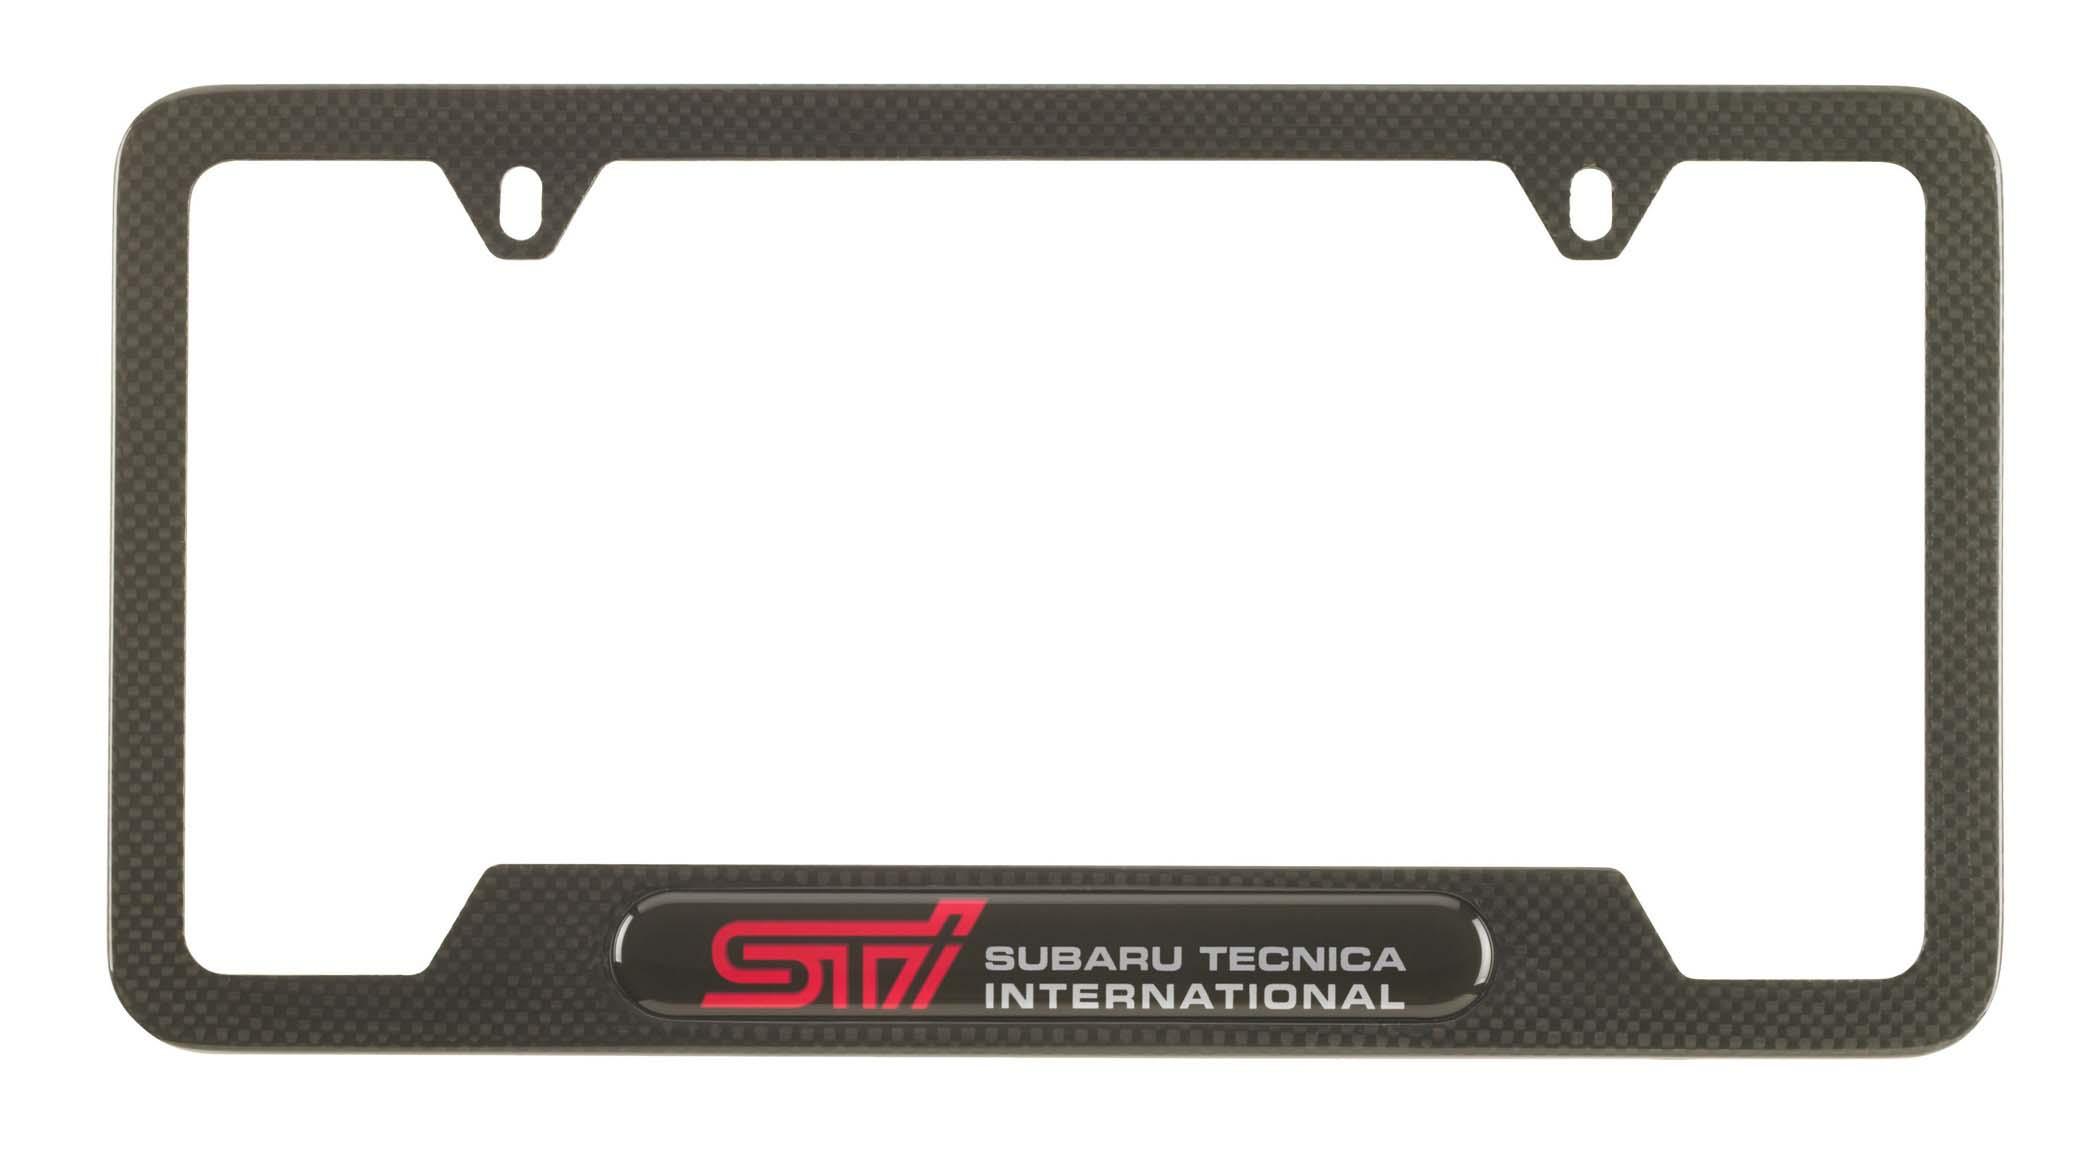 Shop Genuine 2016 Subaru Sti Accessories From Rafferty Subaru